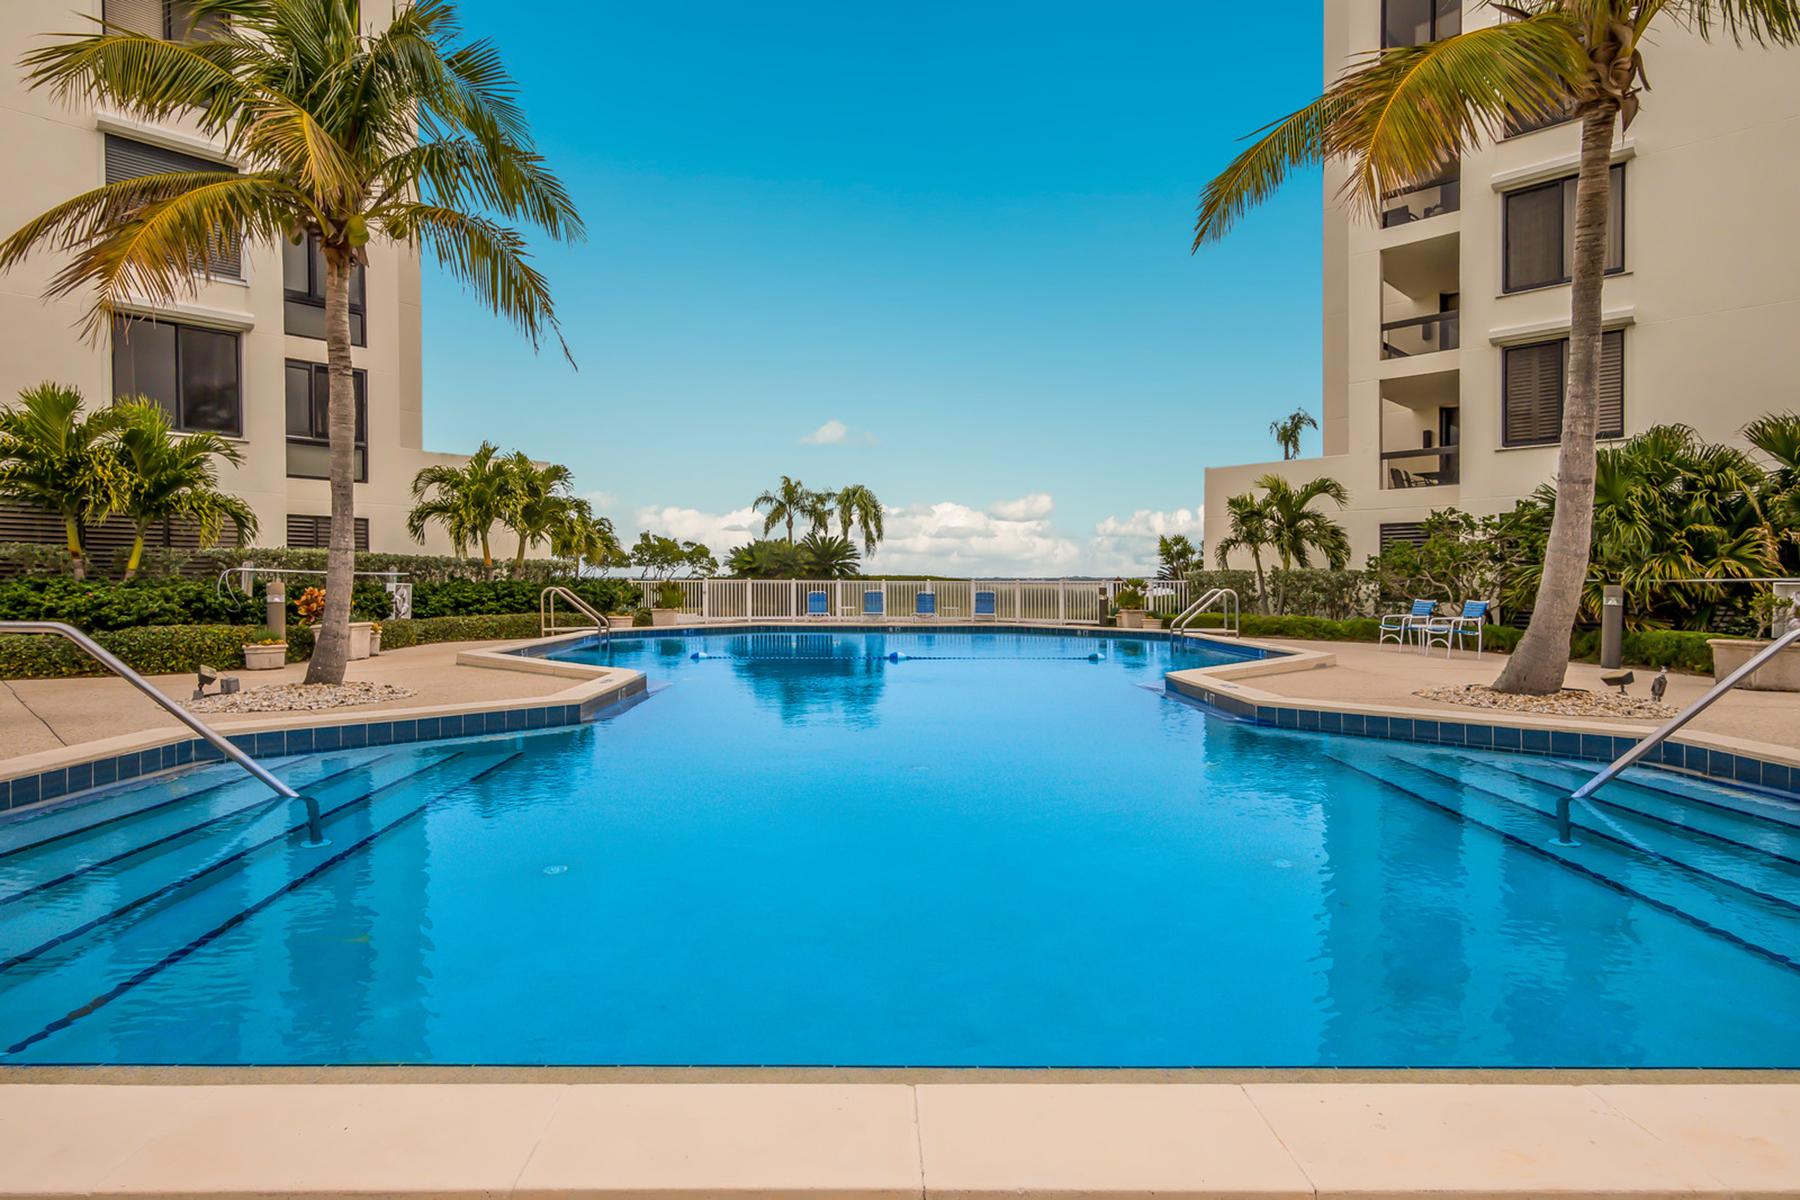 Condominium for Sale at FAIRWAY BAY 2020 Harbourside Dr 452, Longboat Key, Florida 34228 United States